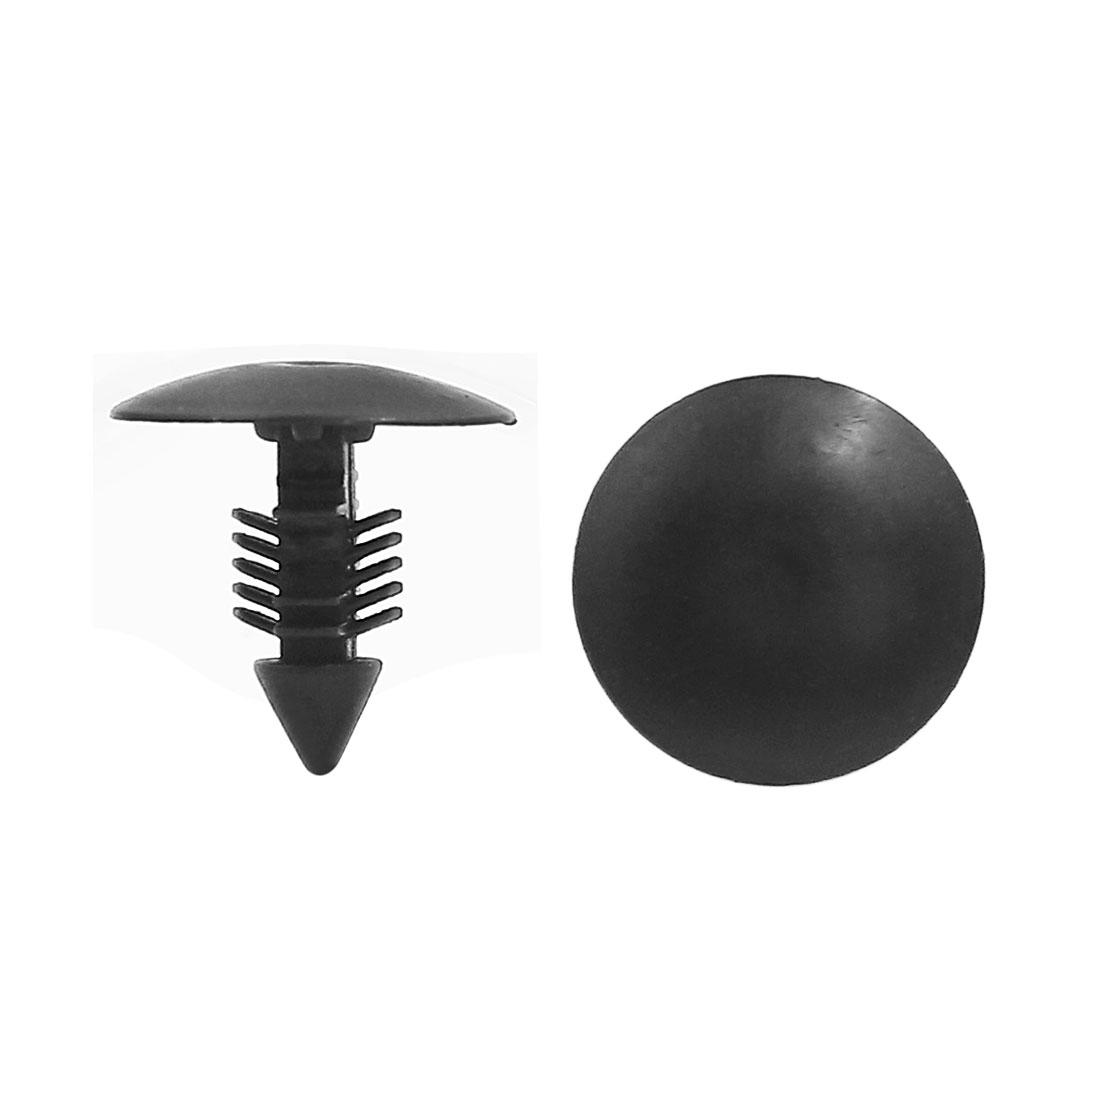 "50pcs Black Plastic Car Door Rivet Push Clips Fasteners for 7mm 2.8"" Dia Hole"